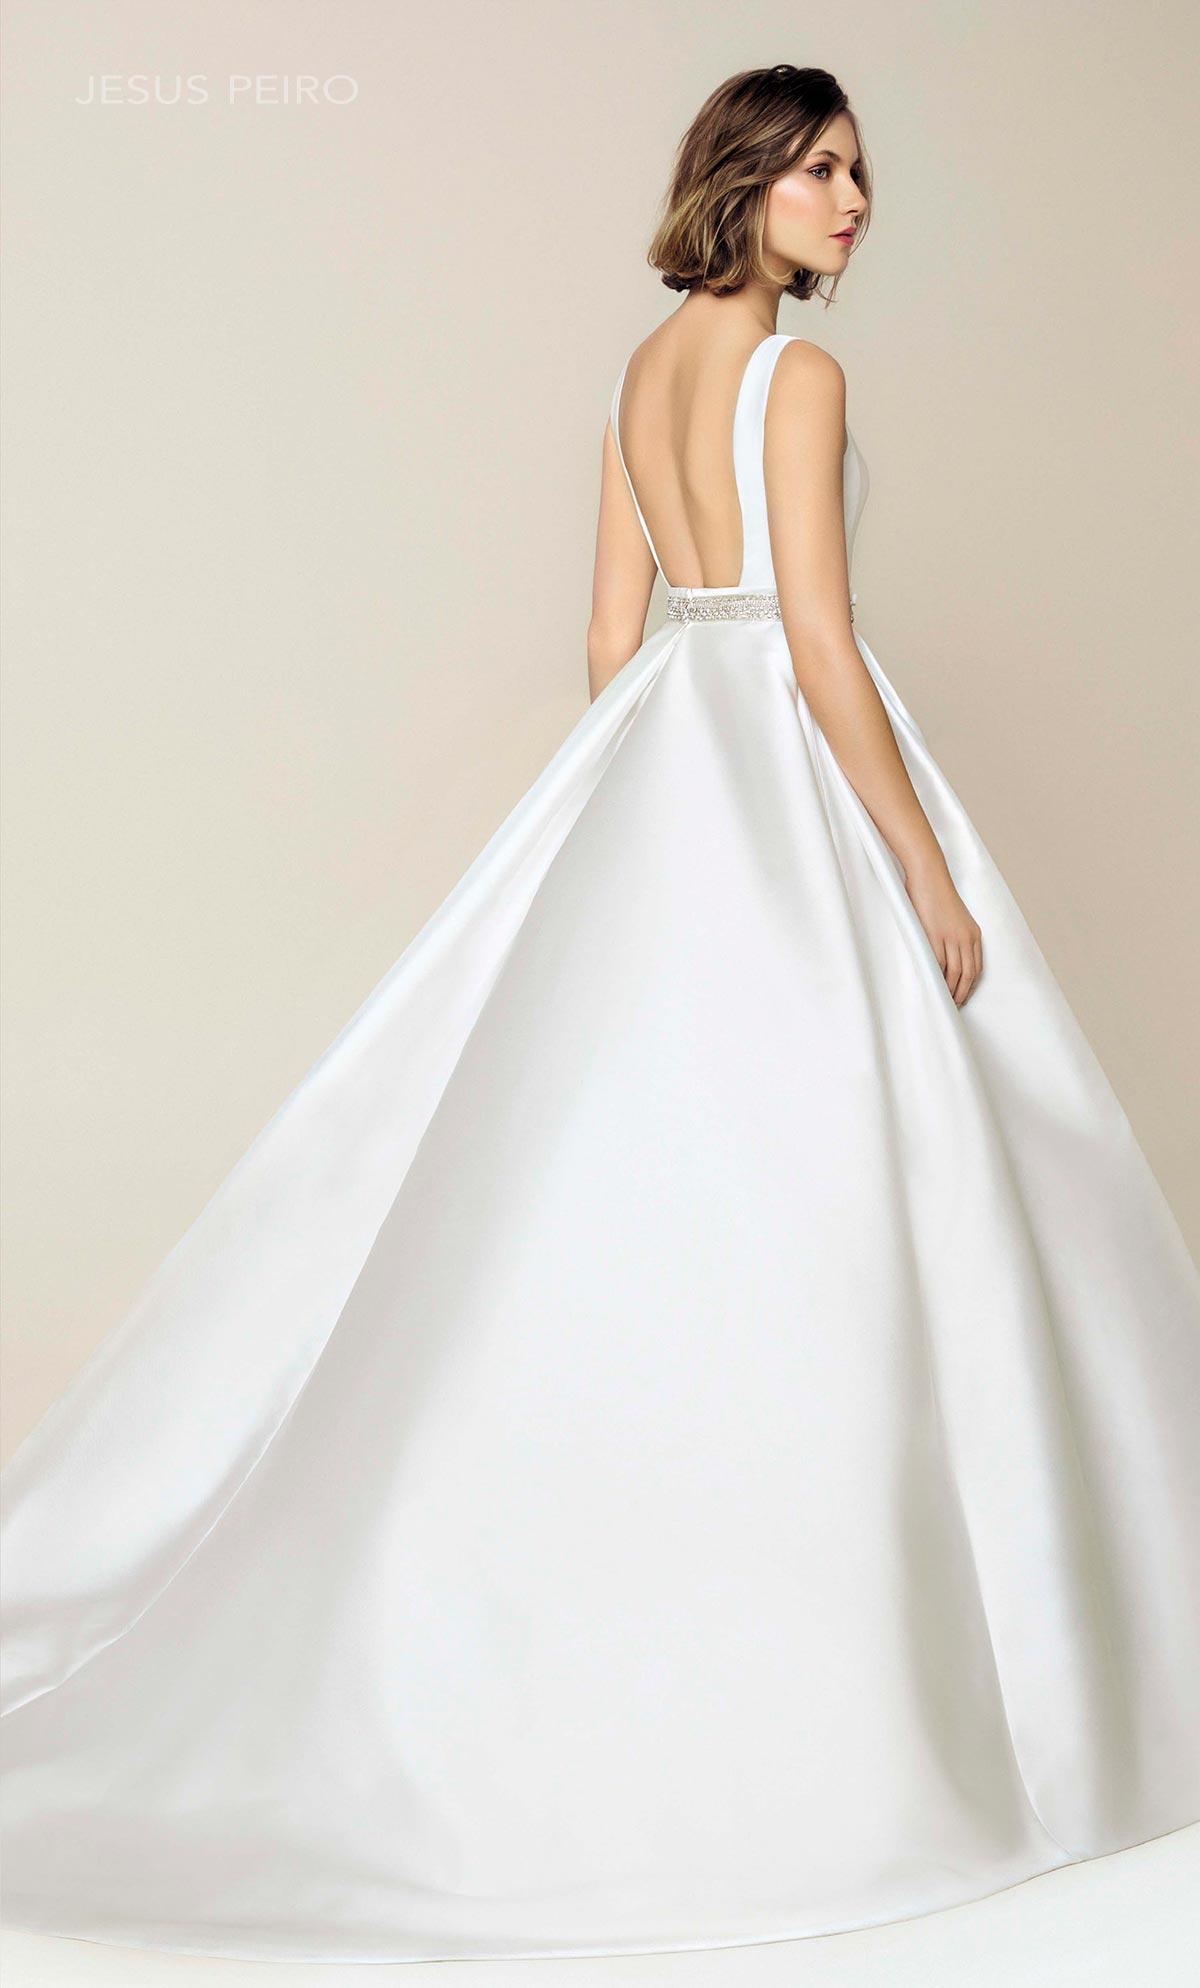 Vestido novia Jesús Peiró Ref.913